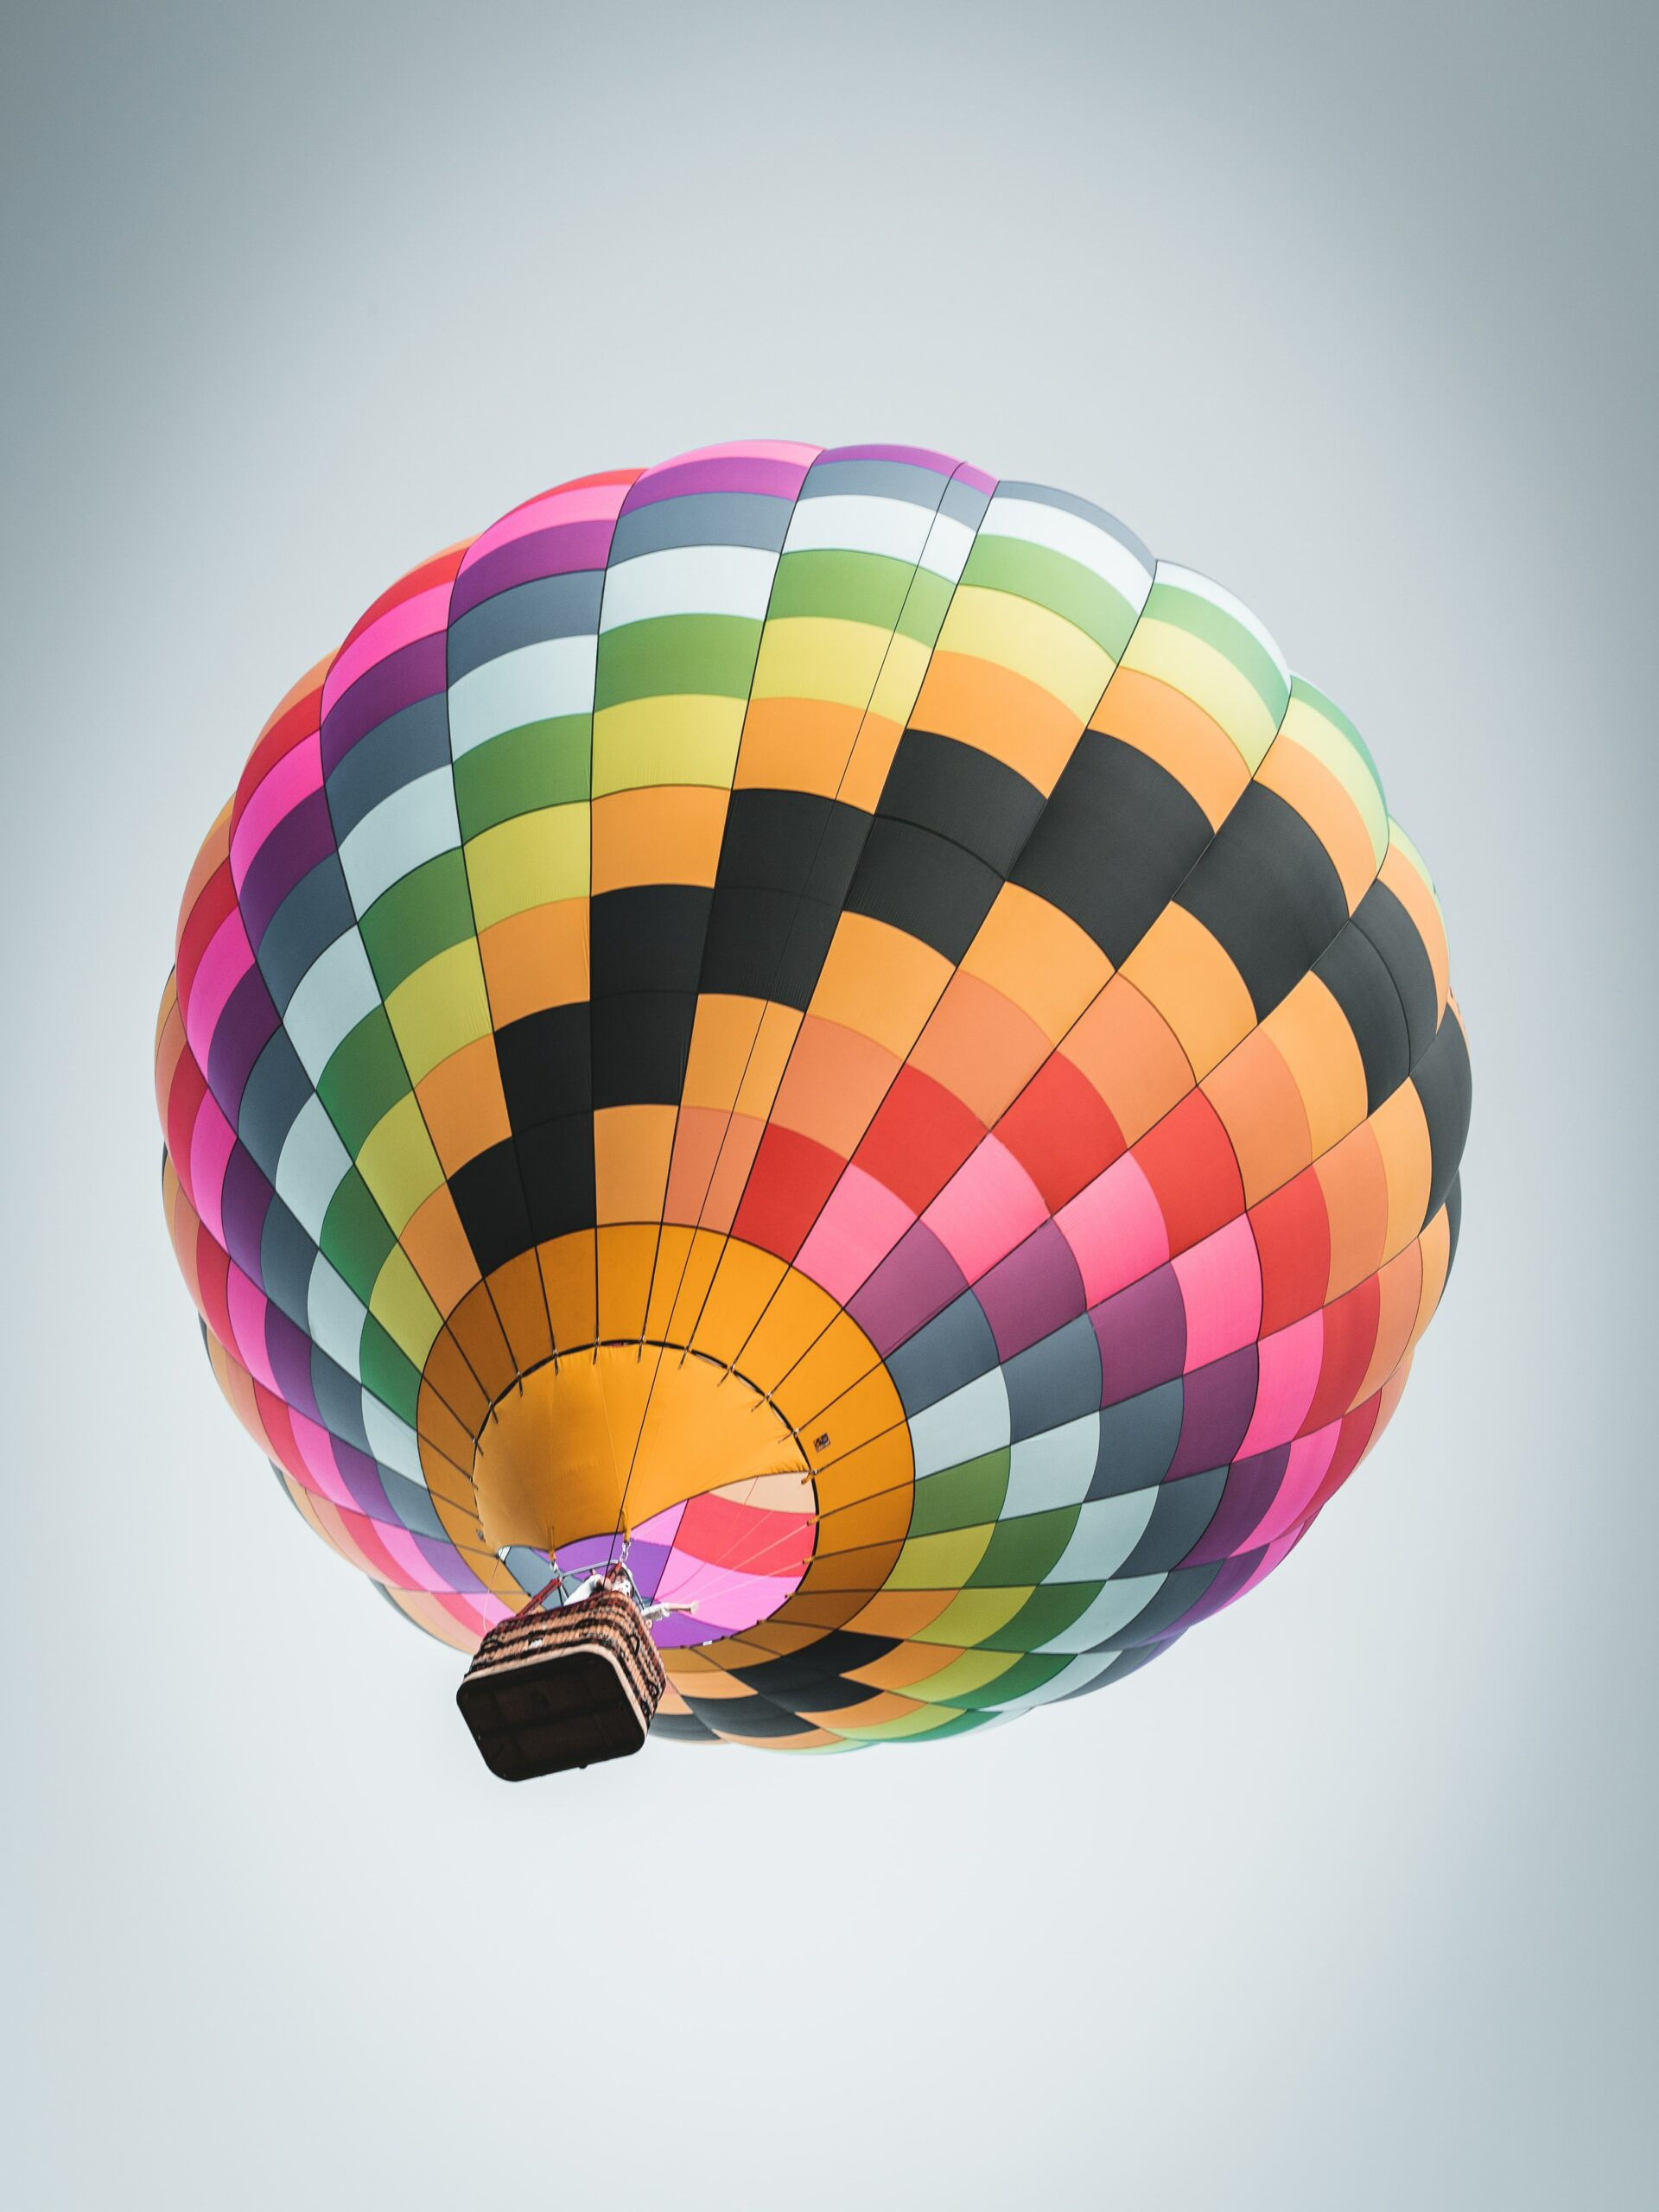 Hot-air balloon rising up into the sky